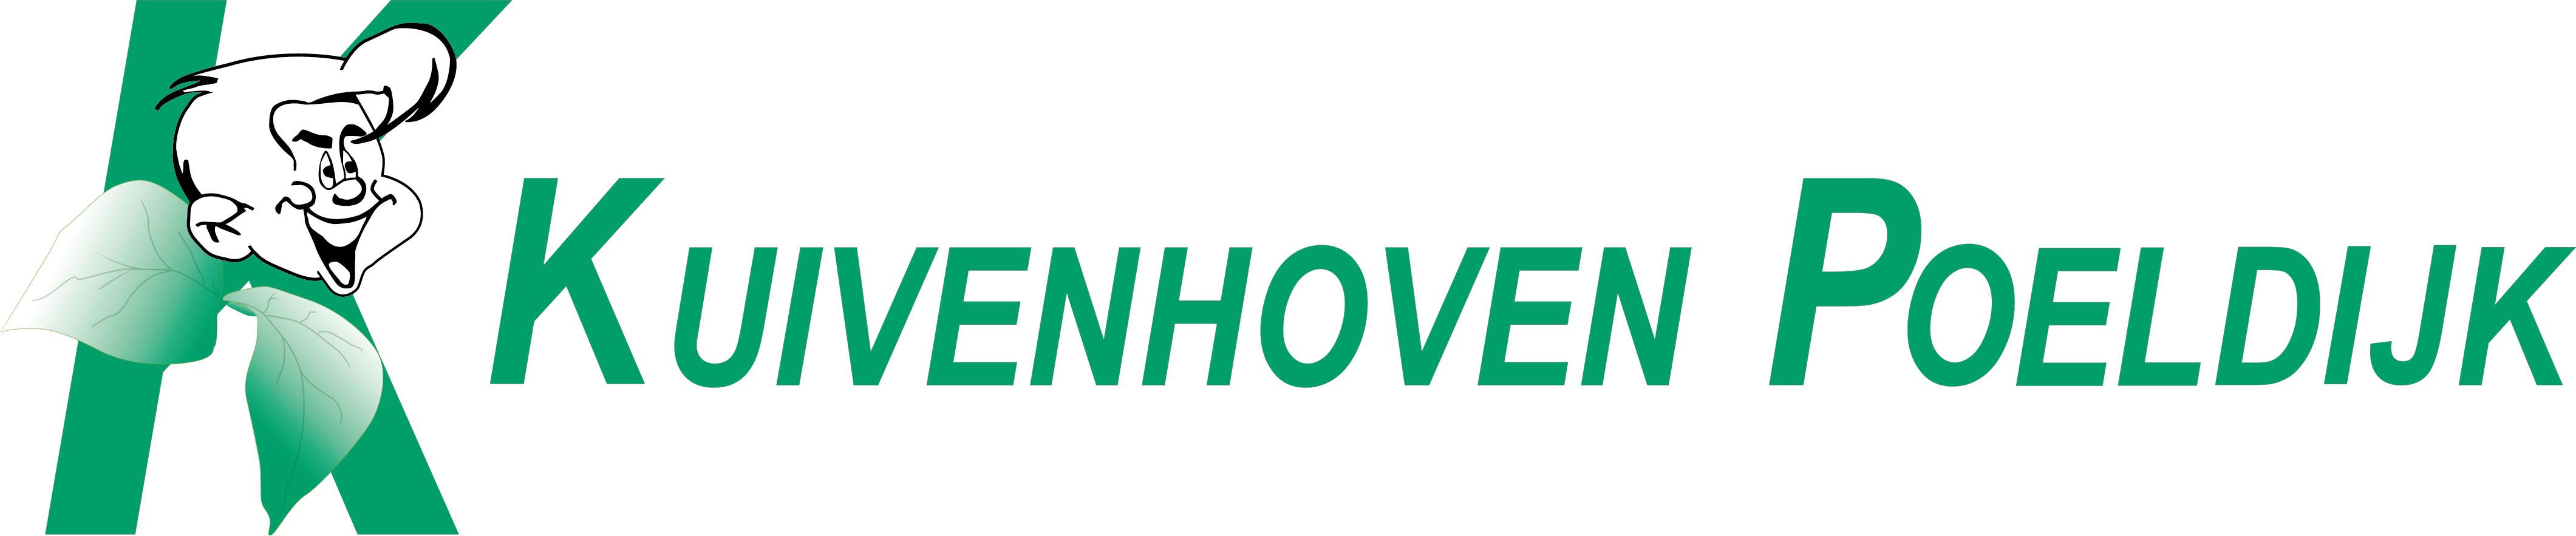 Logo Kuivenhoven Poeldijk